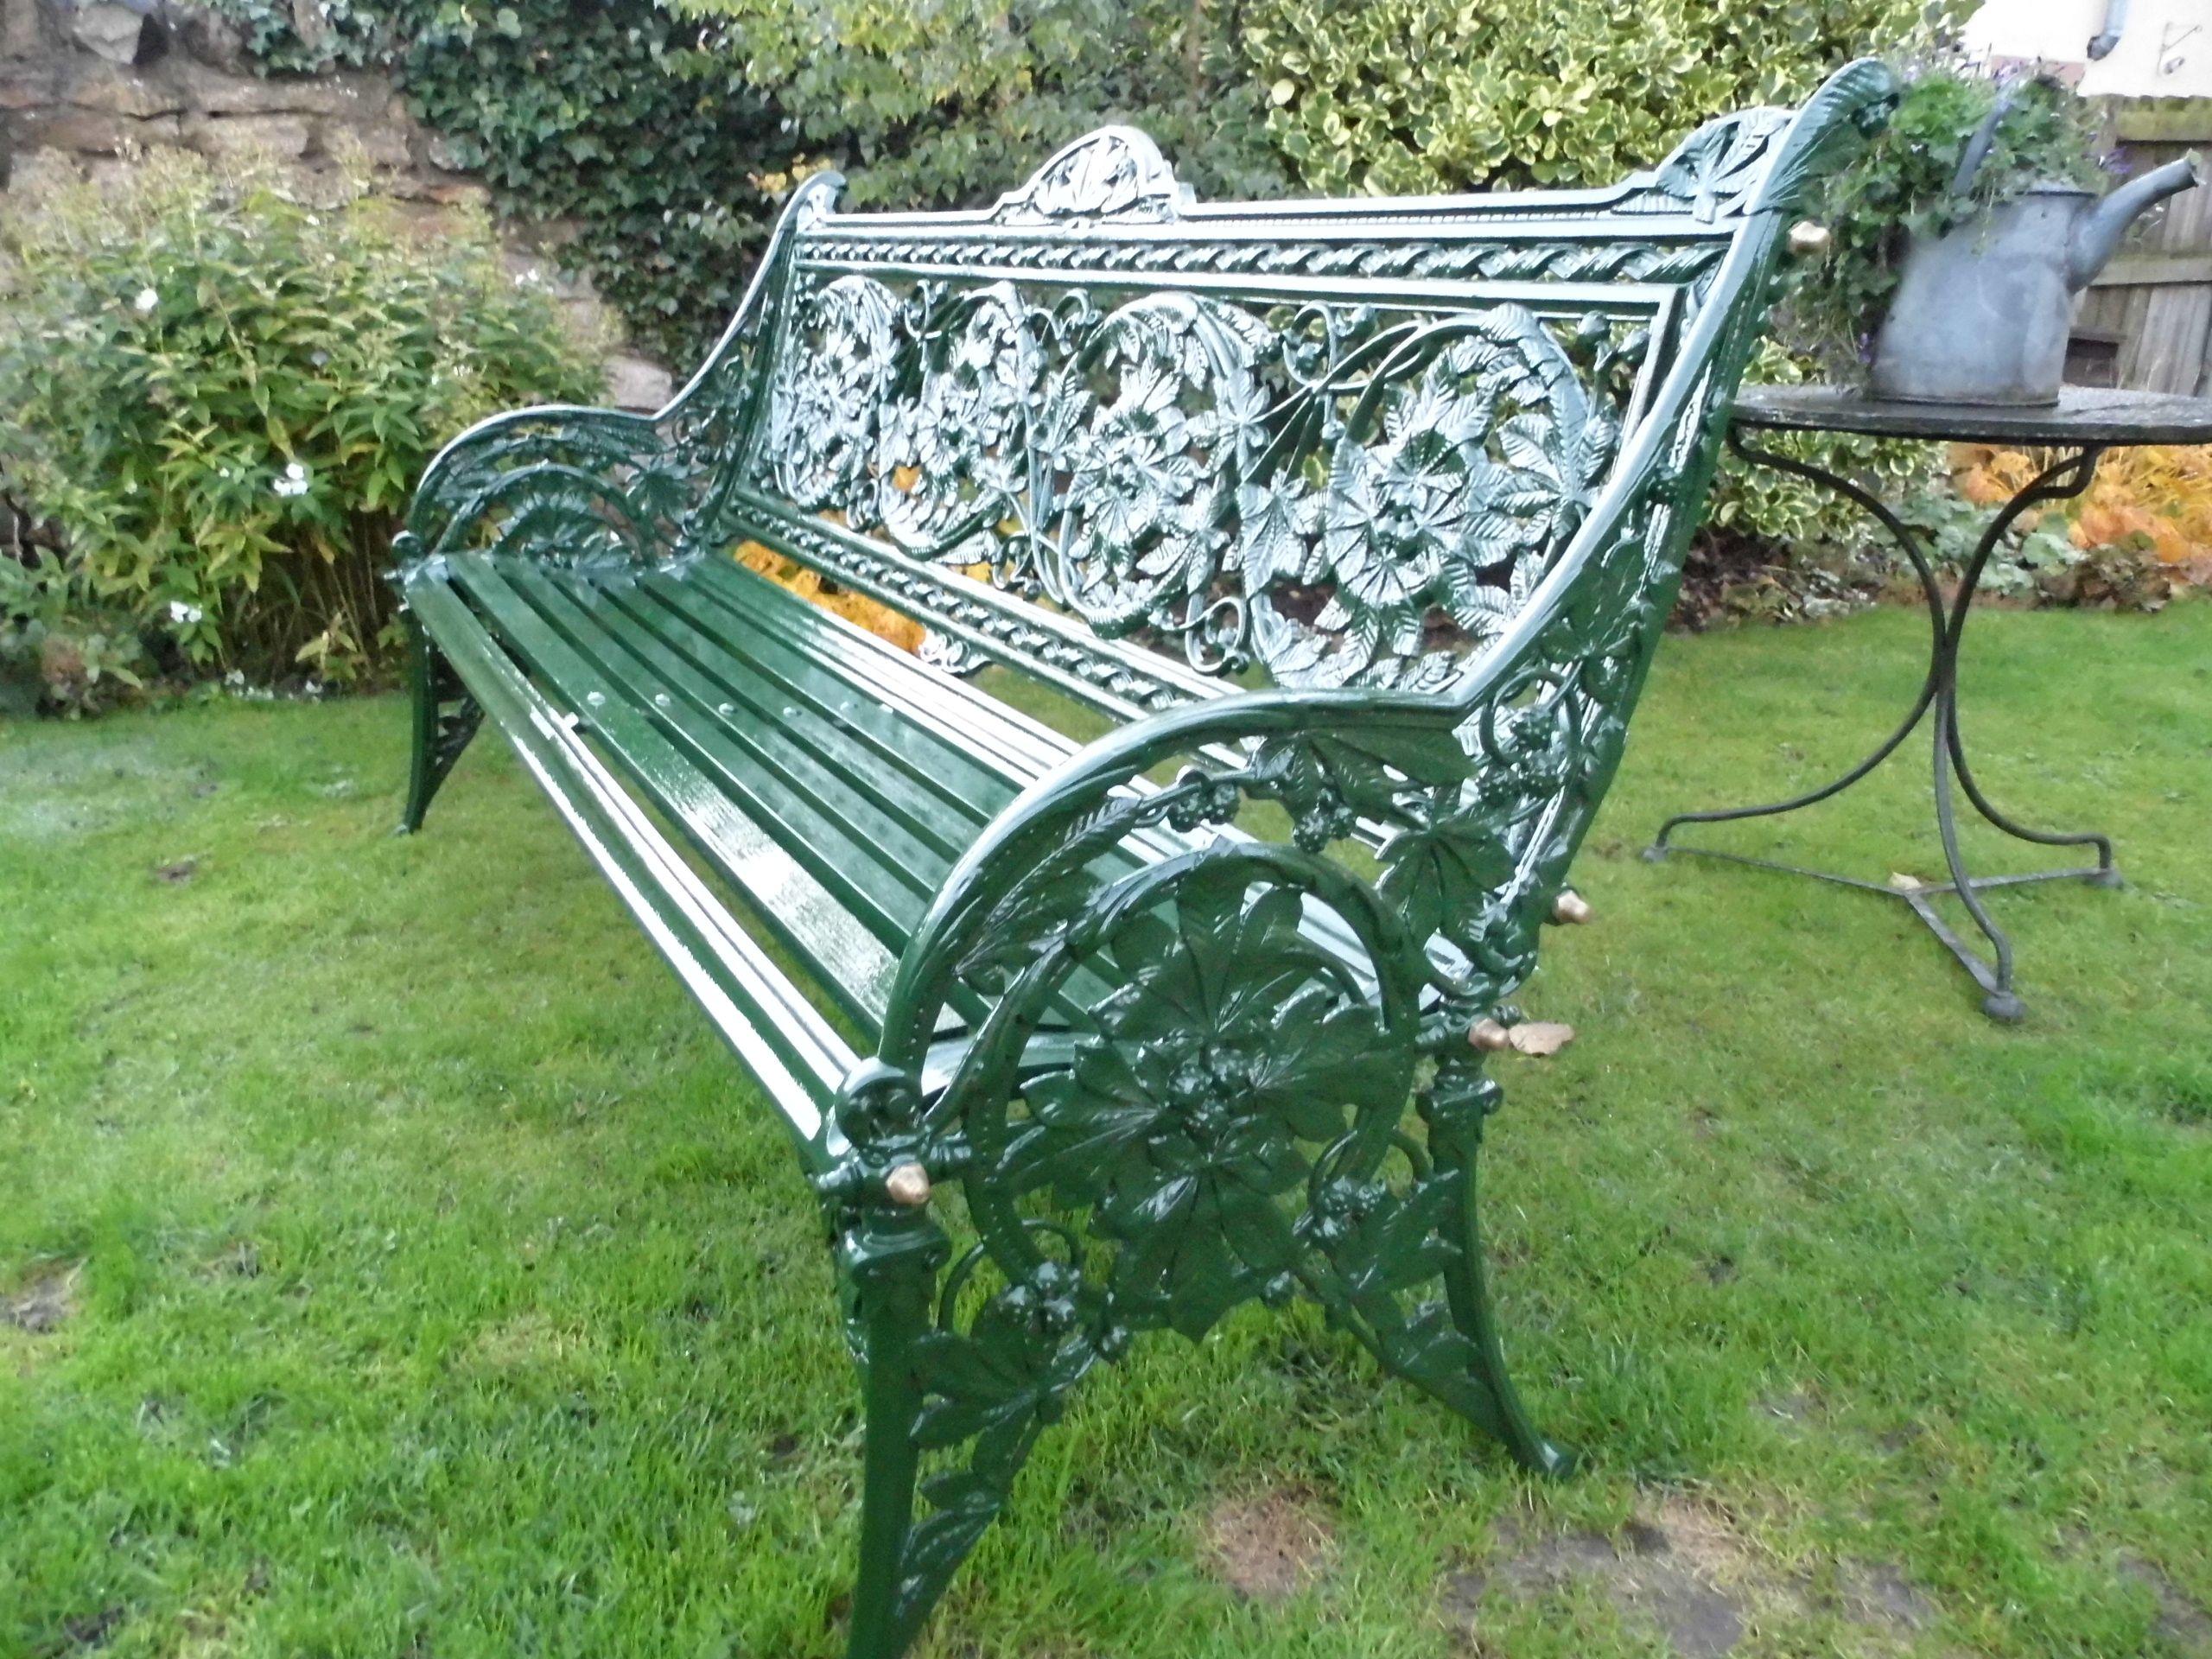 Coalbrookdale Horse Chestnut Bench Arte Ferro Serralheria E